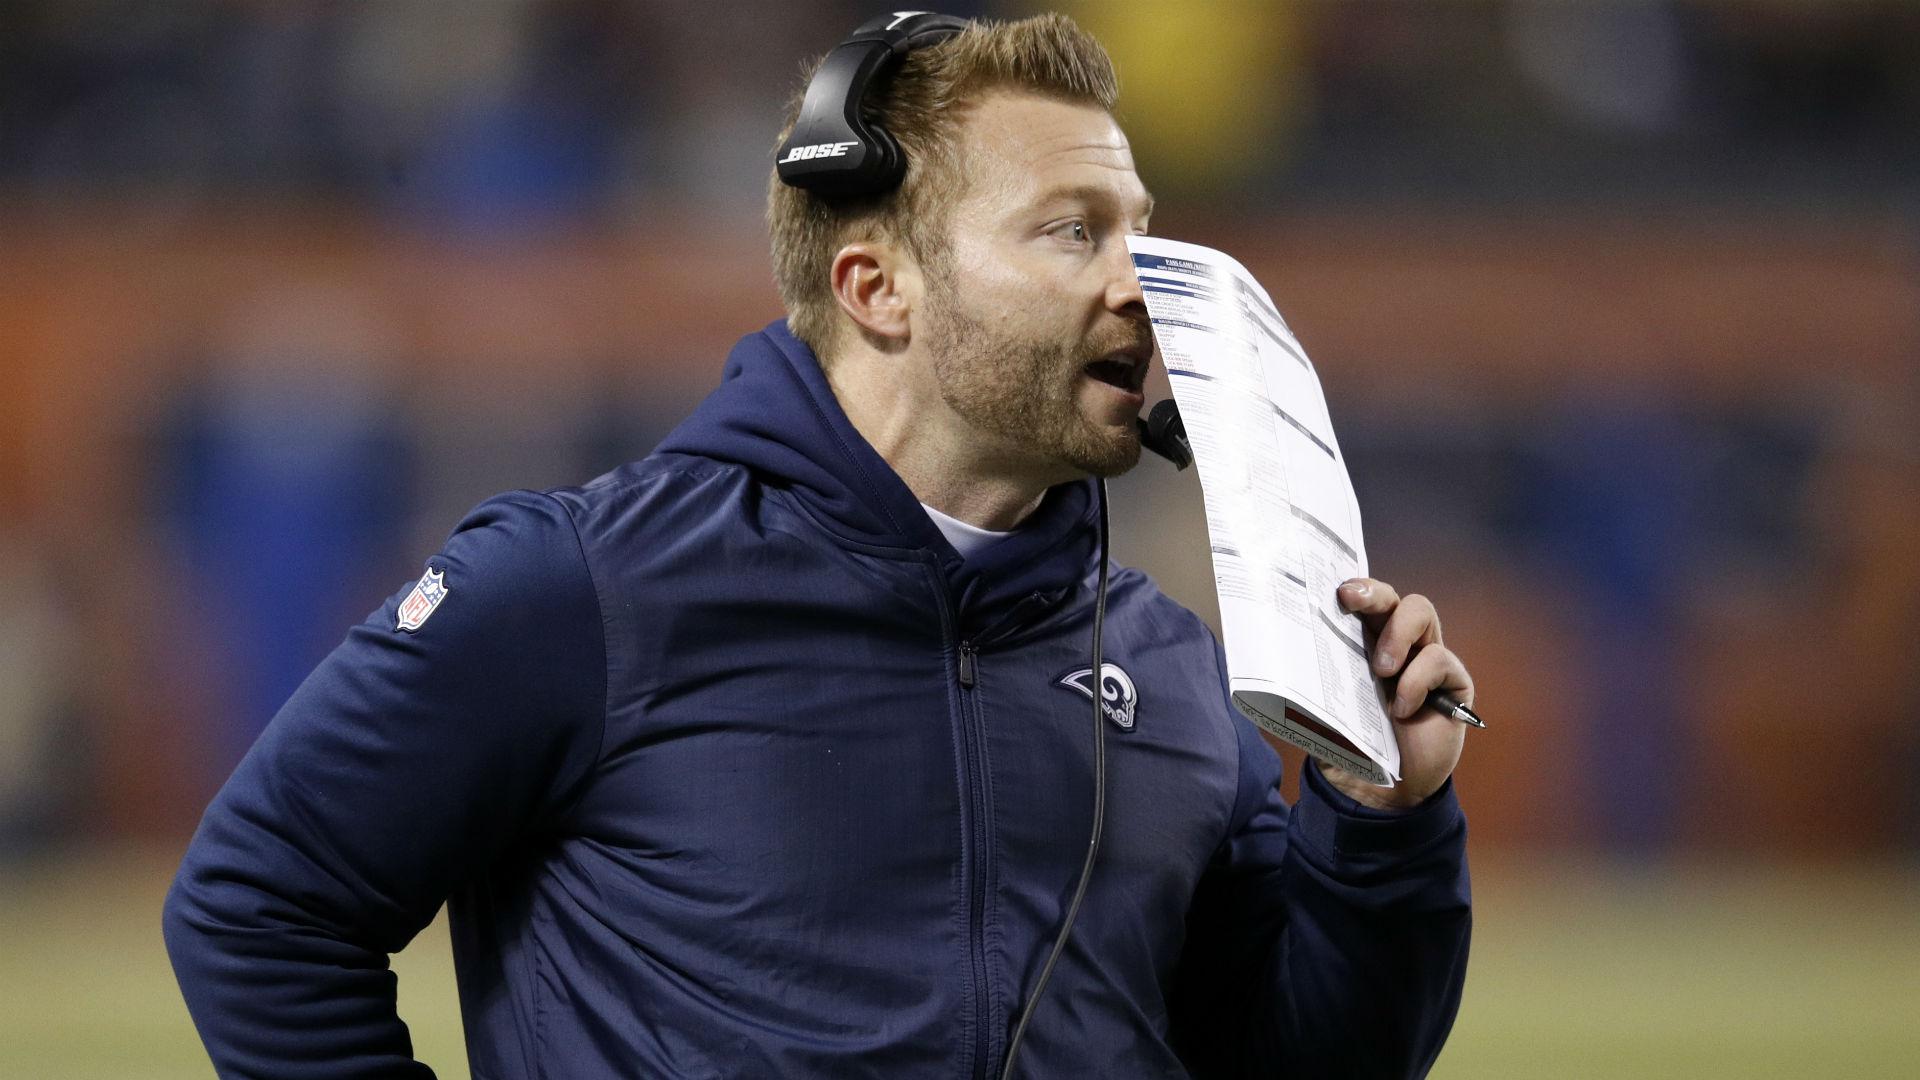 Sean McVay broke down plays on TV in real time during Rams-Cowboys preseason game